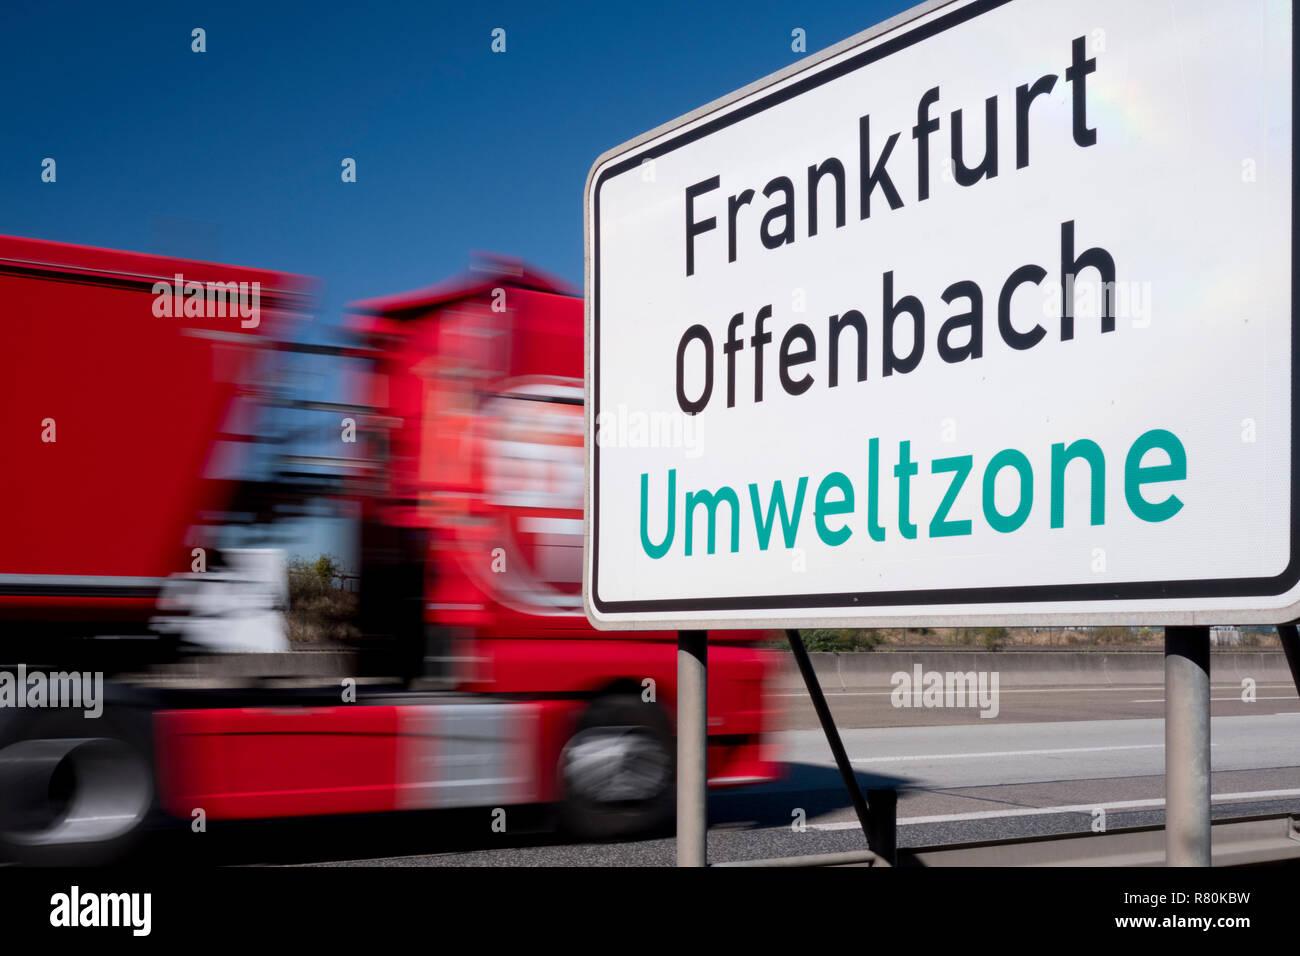 Sign marking a low-emission zone near the city Farnkfurt, Hesse, Germany - Stock Image